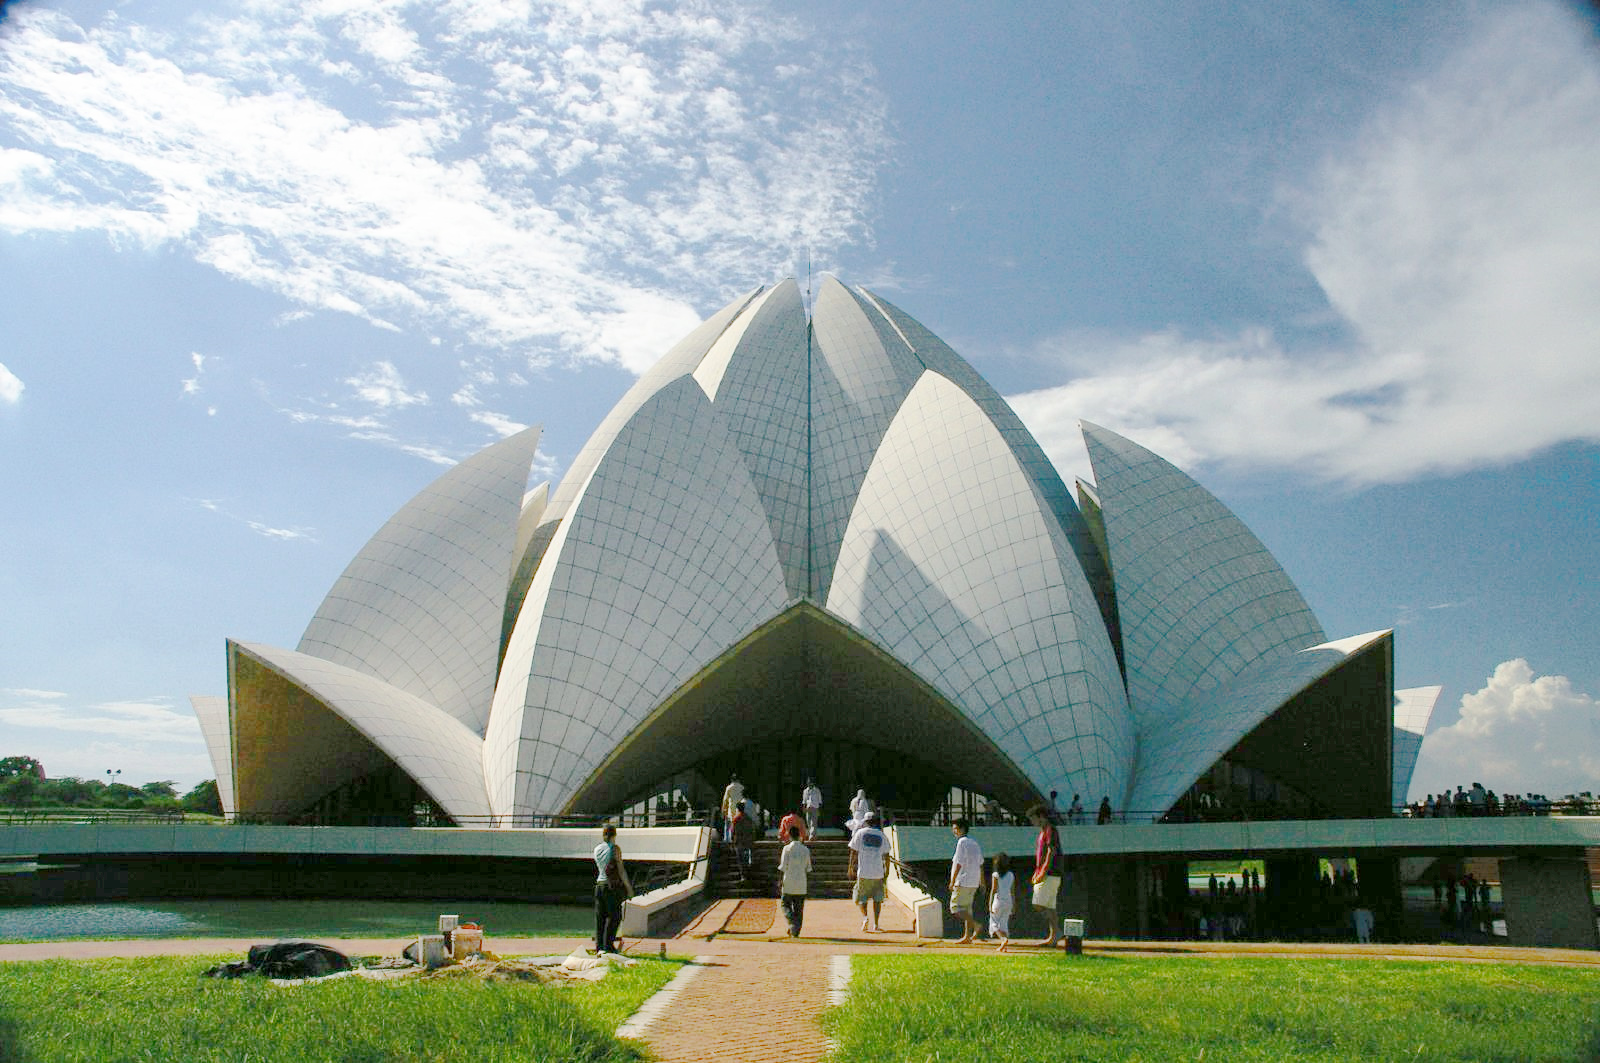 https://i0.wp.com/upload.wikimedia.org/wikipedia/commons/1/16/New_delhi_temple.jpg